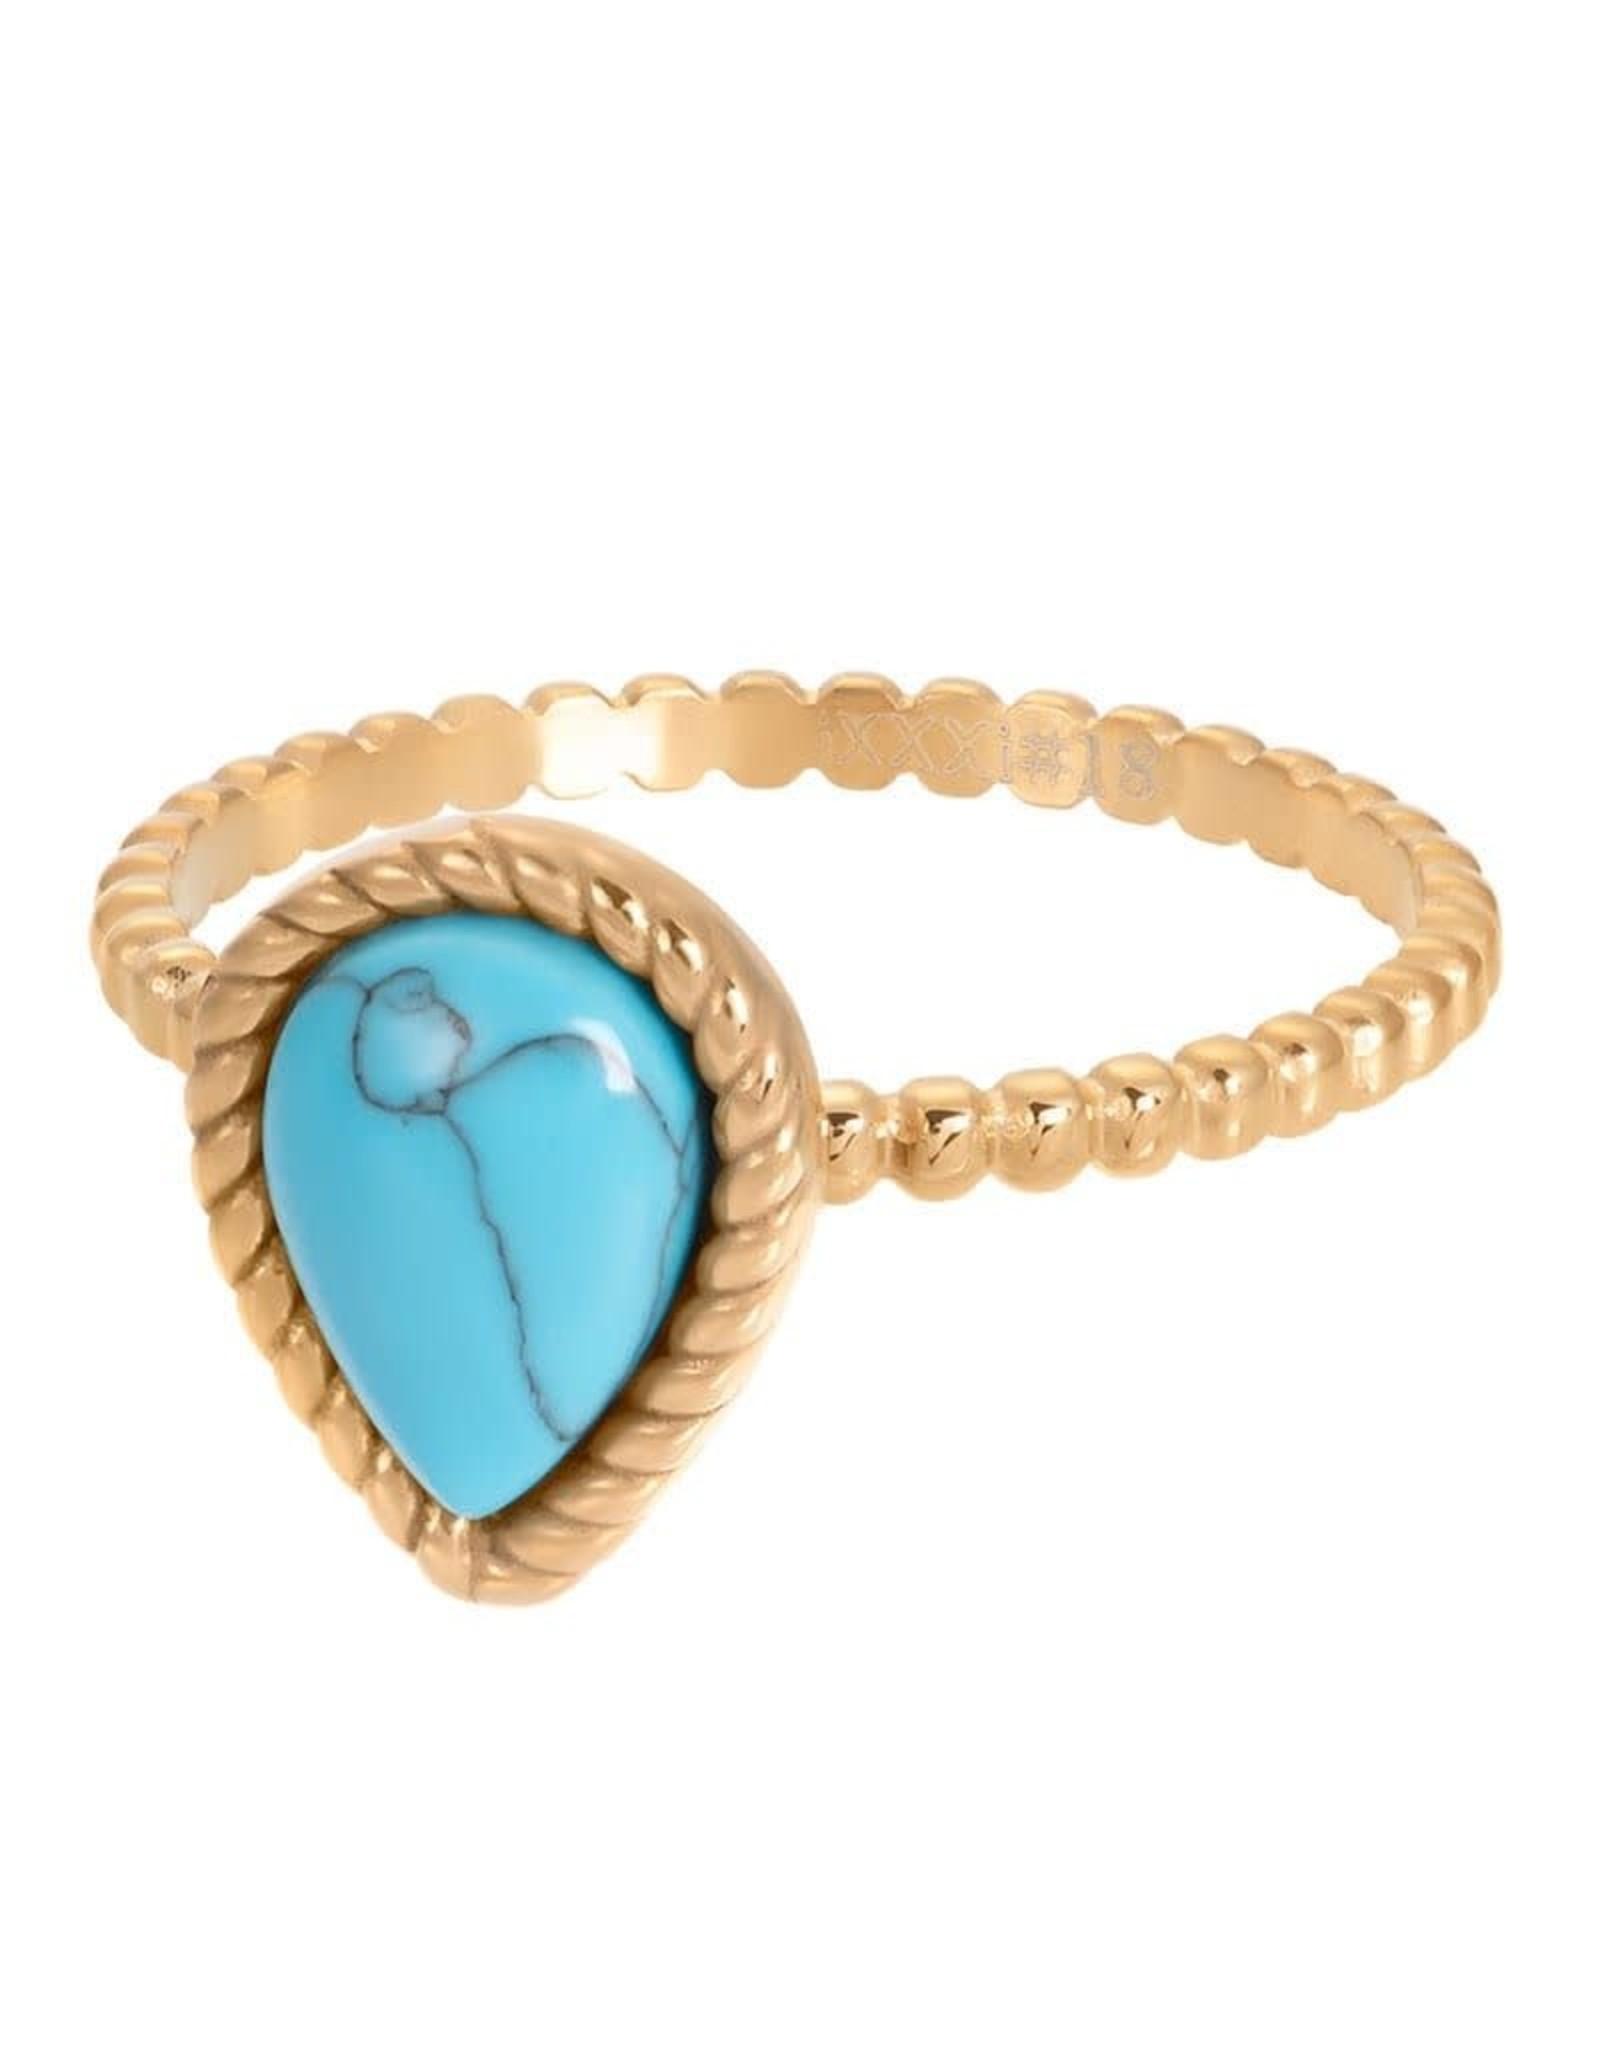 iXXXi Jewelry iXXXi vulring Magic turquoise - goud